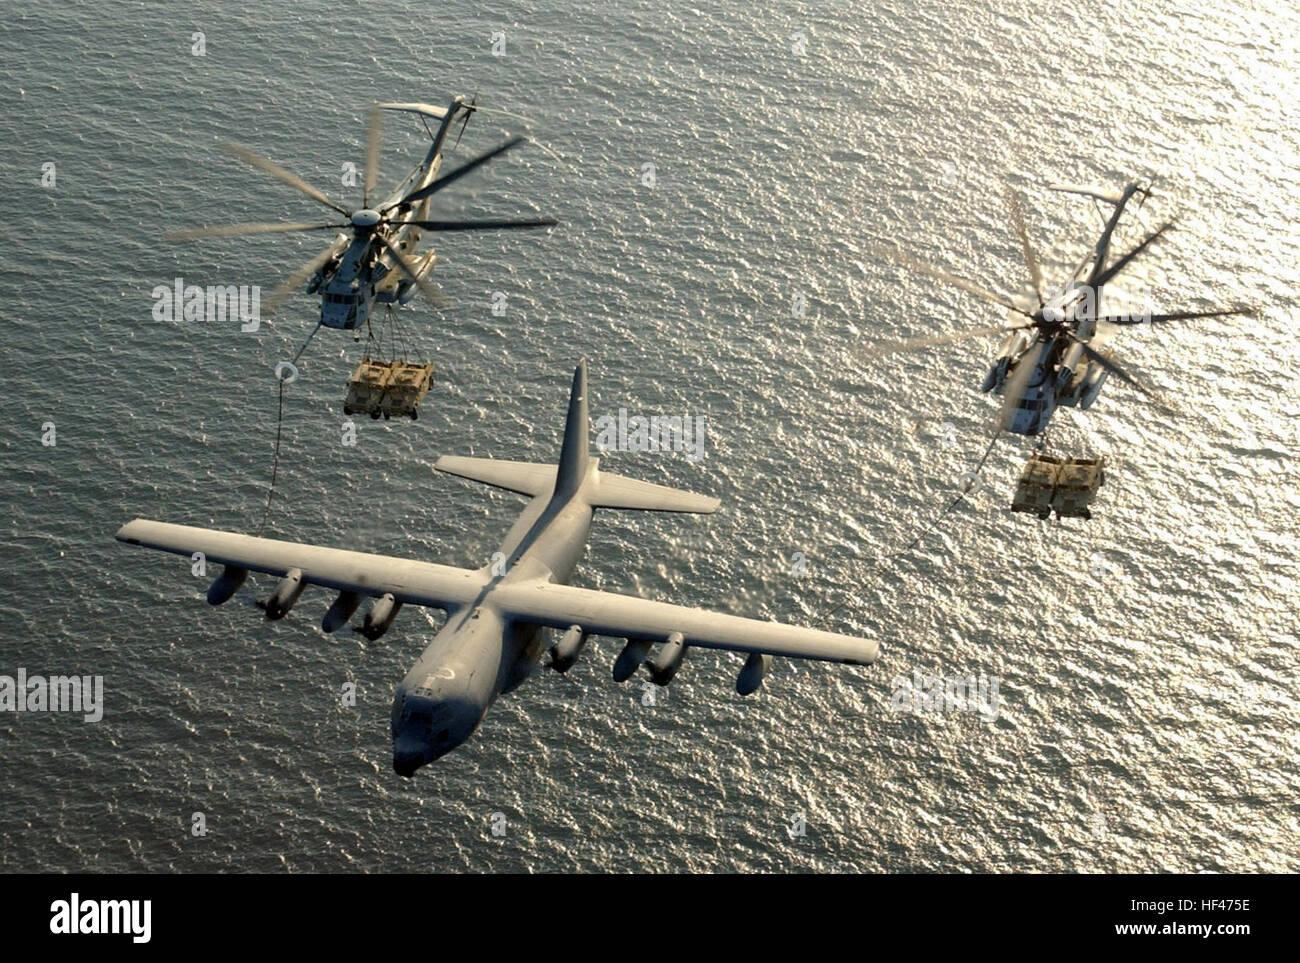 030130-M-0000X-001 Camp Lemonier, Djibouti (Jan. 30, 2003) Ð Two U.S. Marine Corps CH-53E Super Stallion helicopters - Stock Image